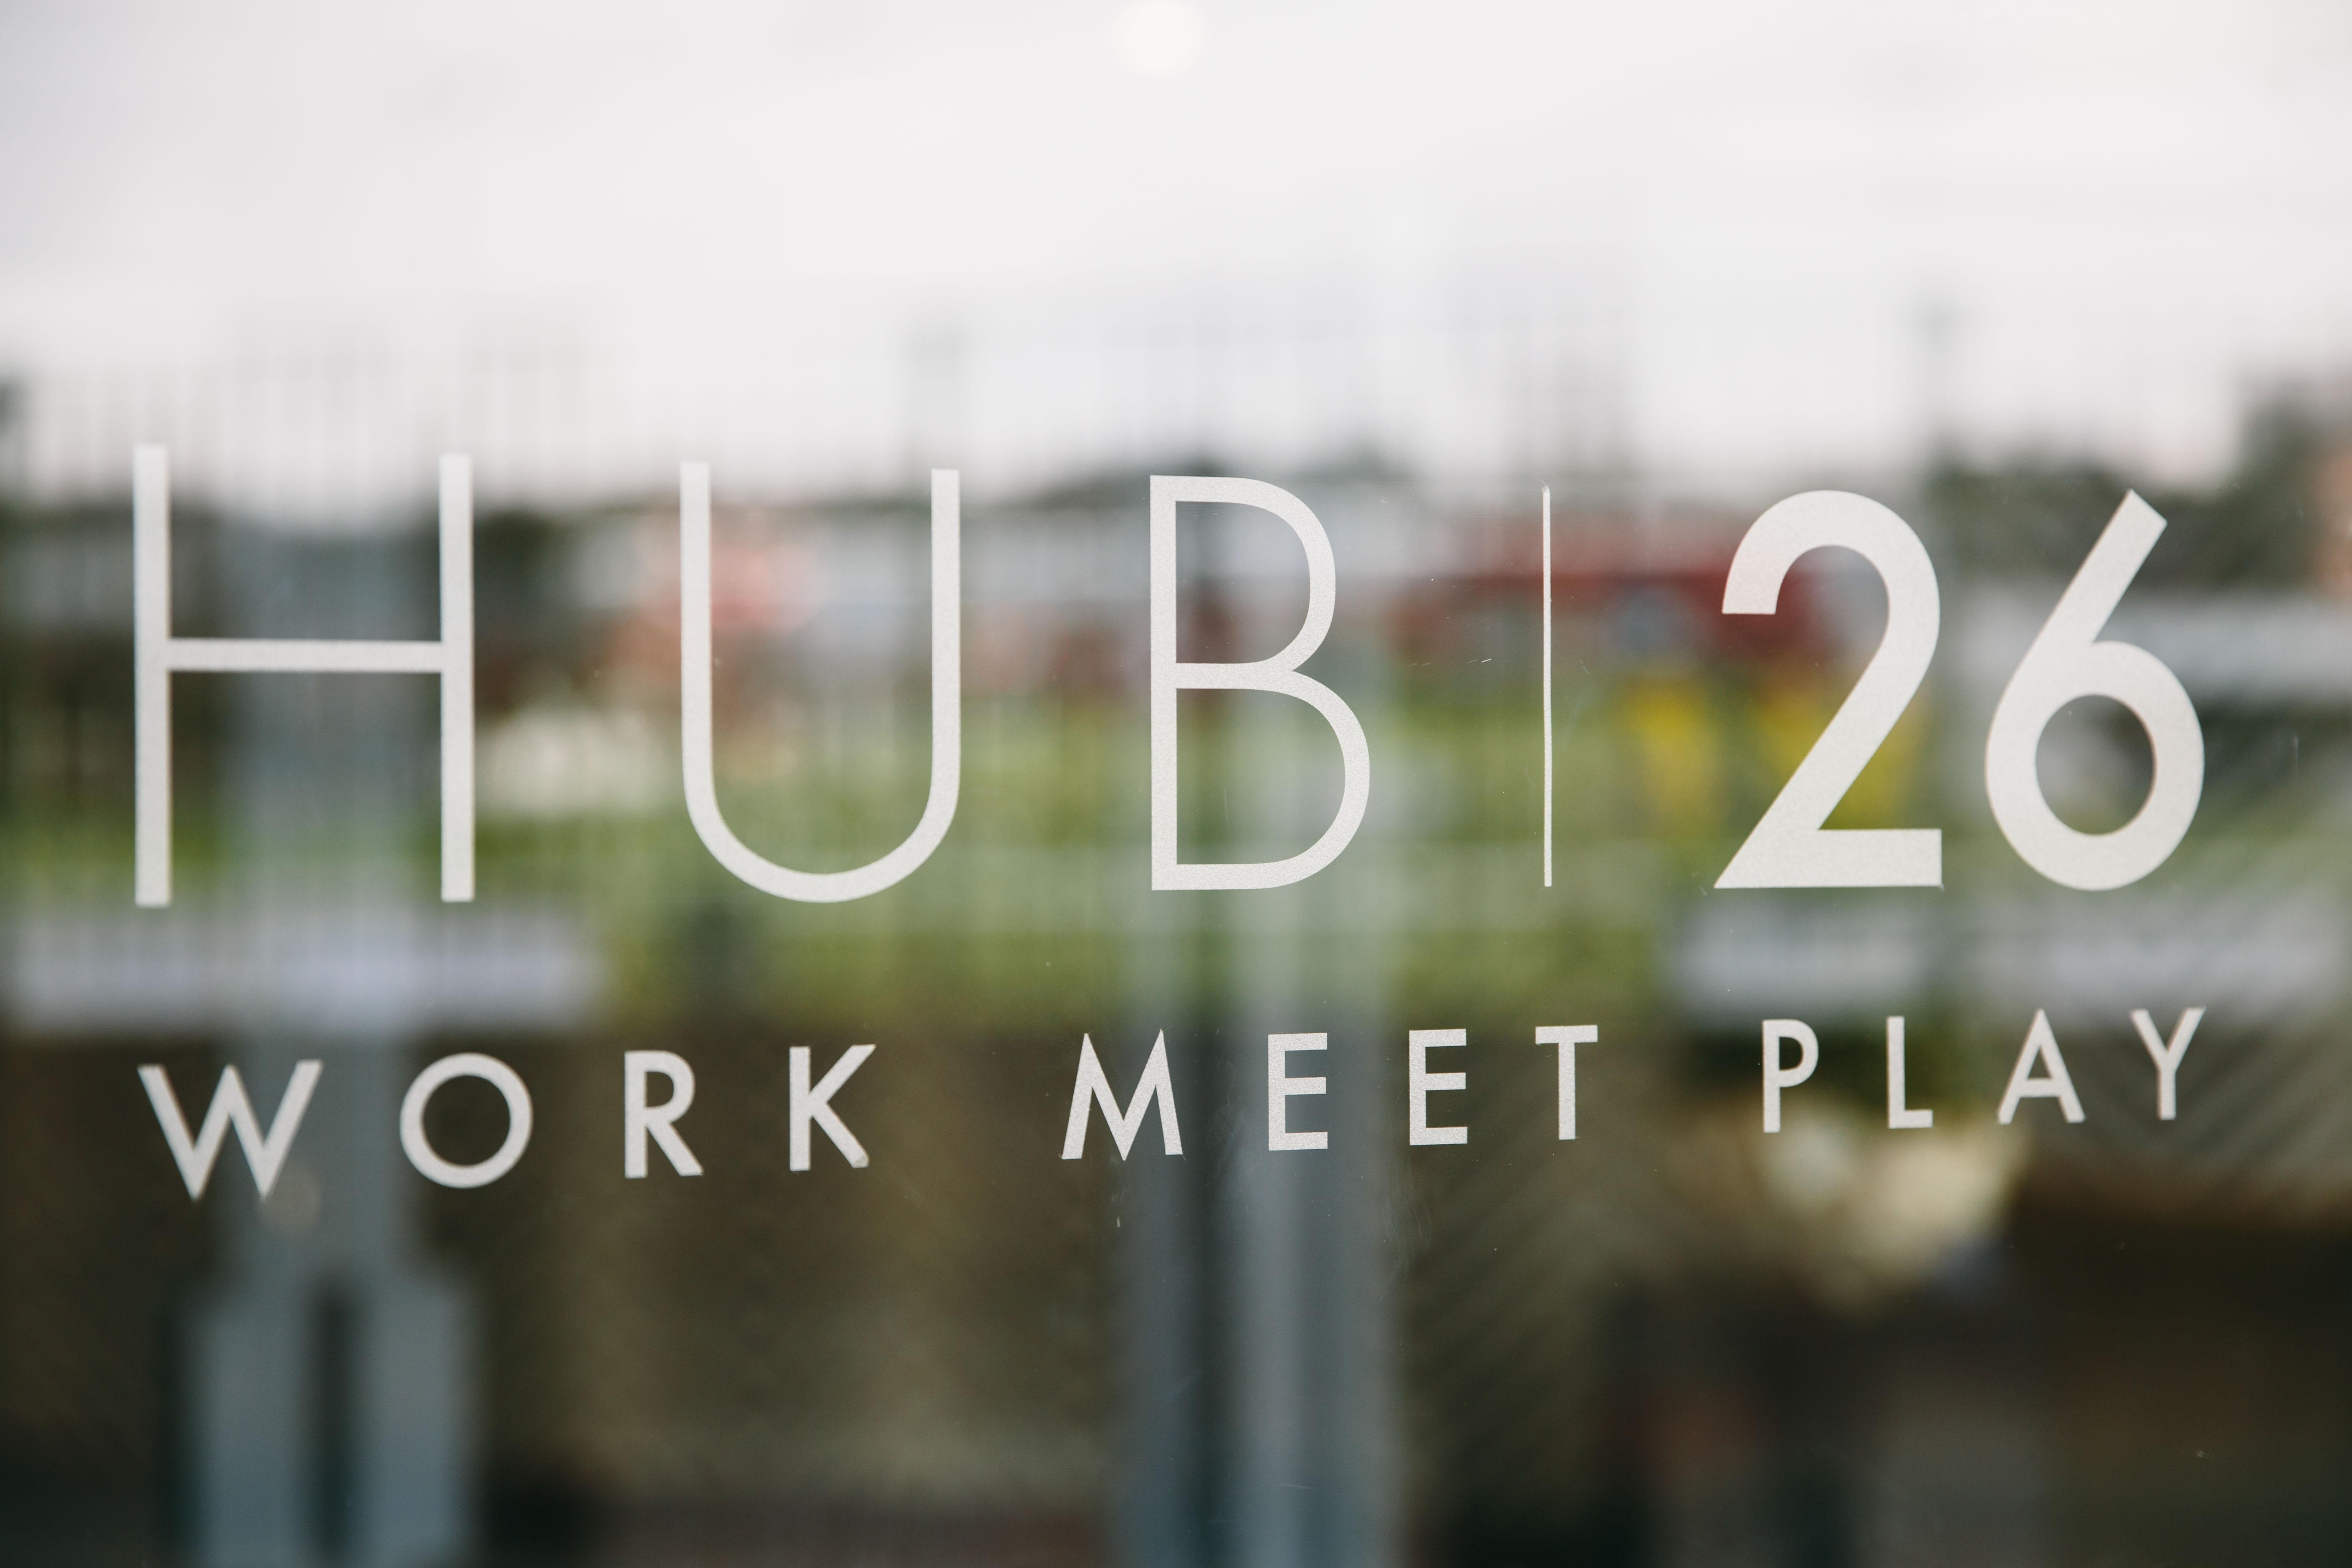 Hub26